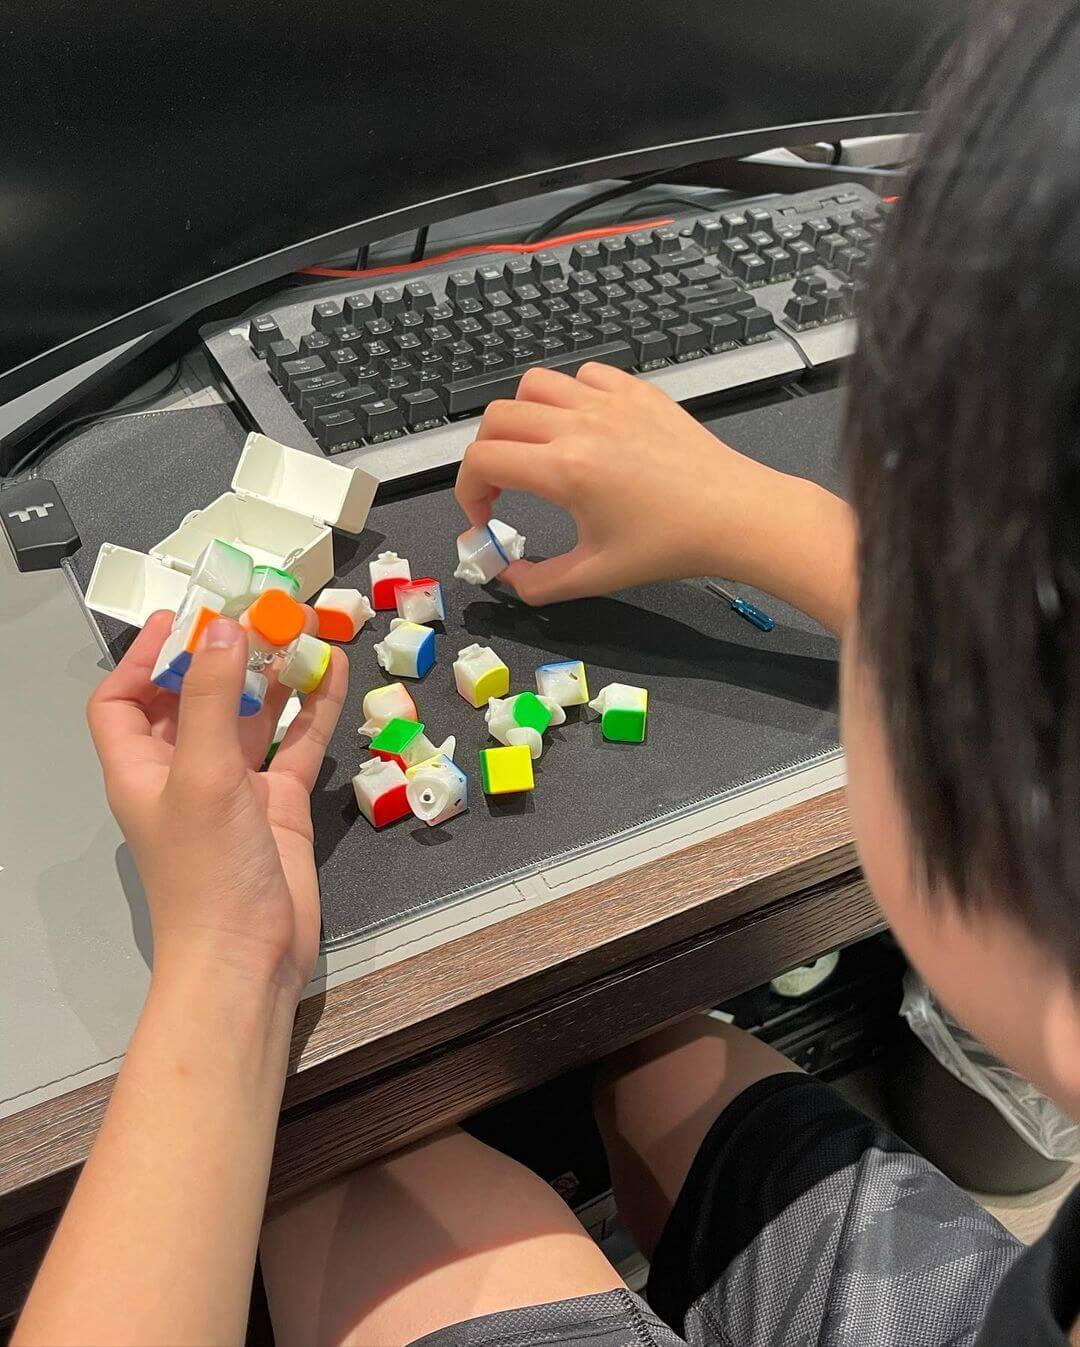 Kimi幫忙清潔扭計骰